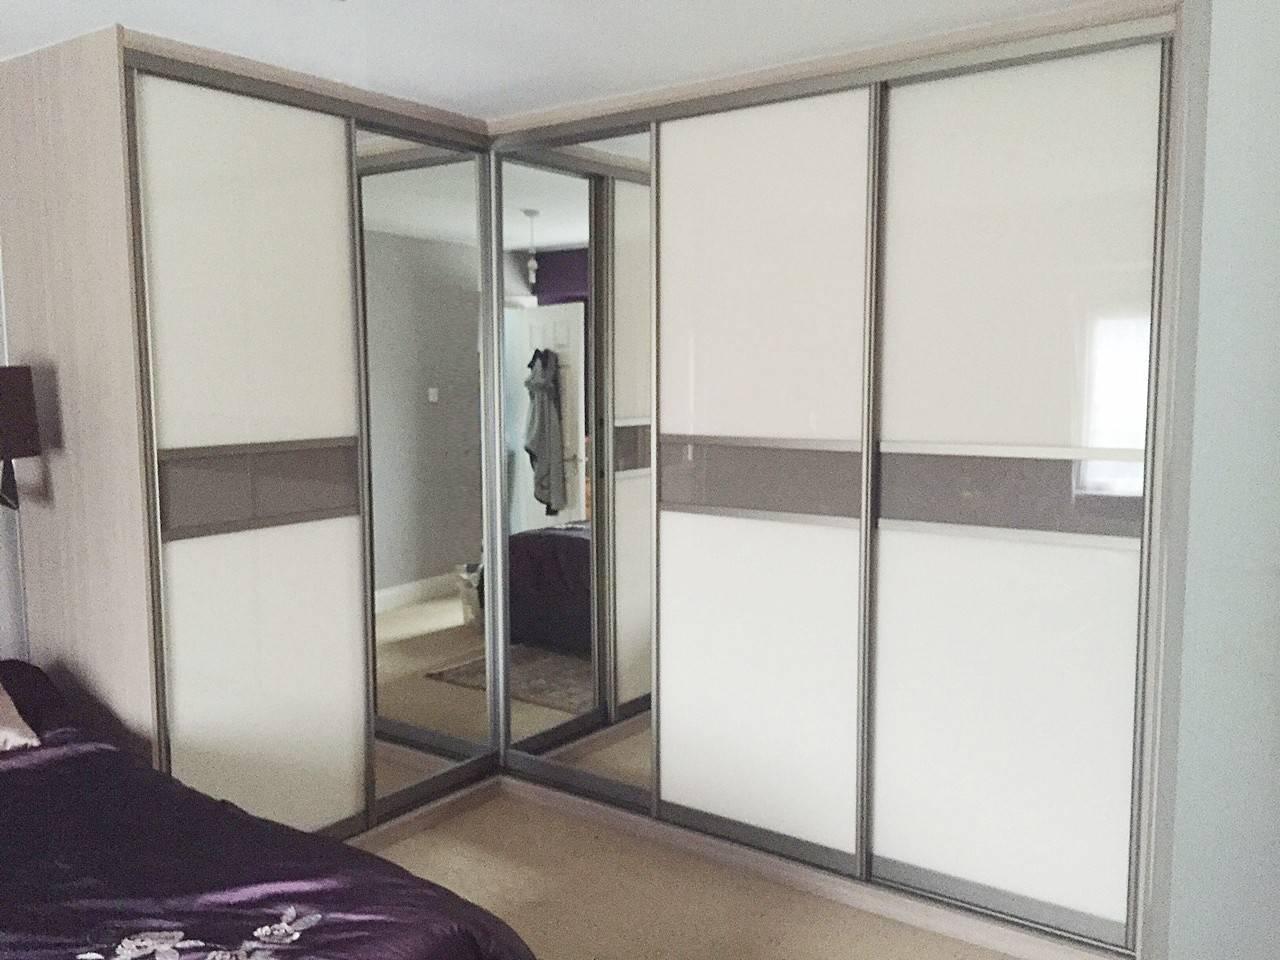 Corner Wardrobes | Slideglide - Sliding Wardrobes And Storage with regard to Corner Wardrobes (Image 9 of 15)